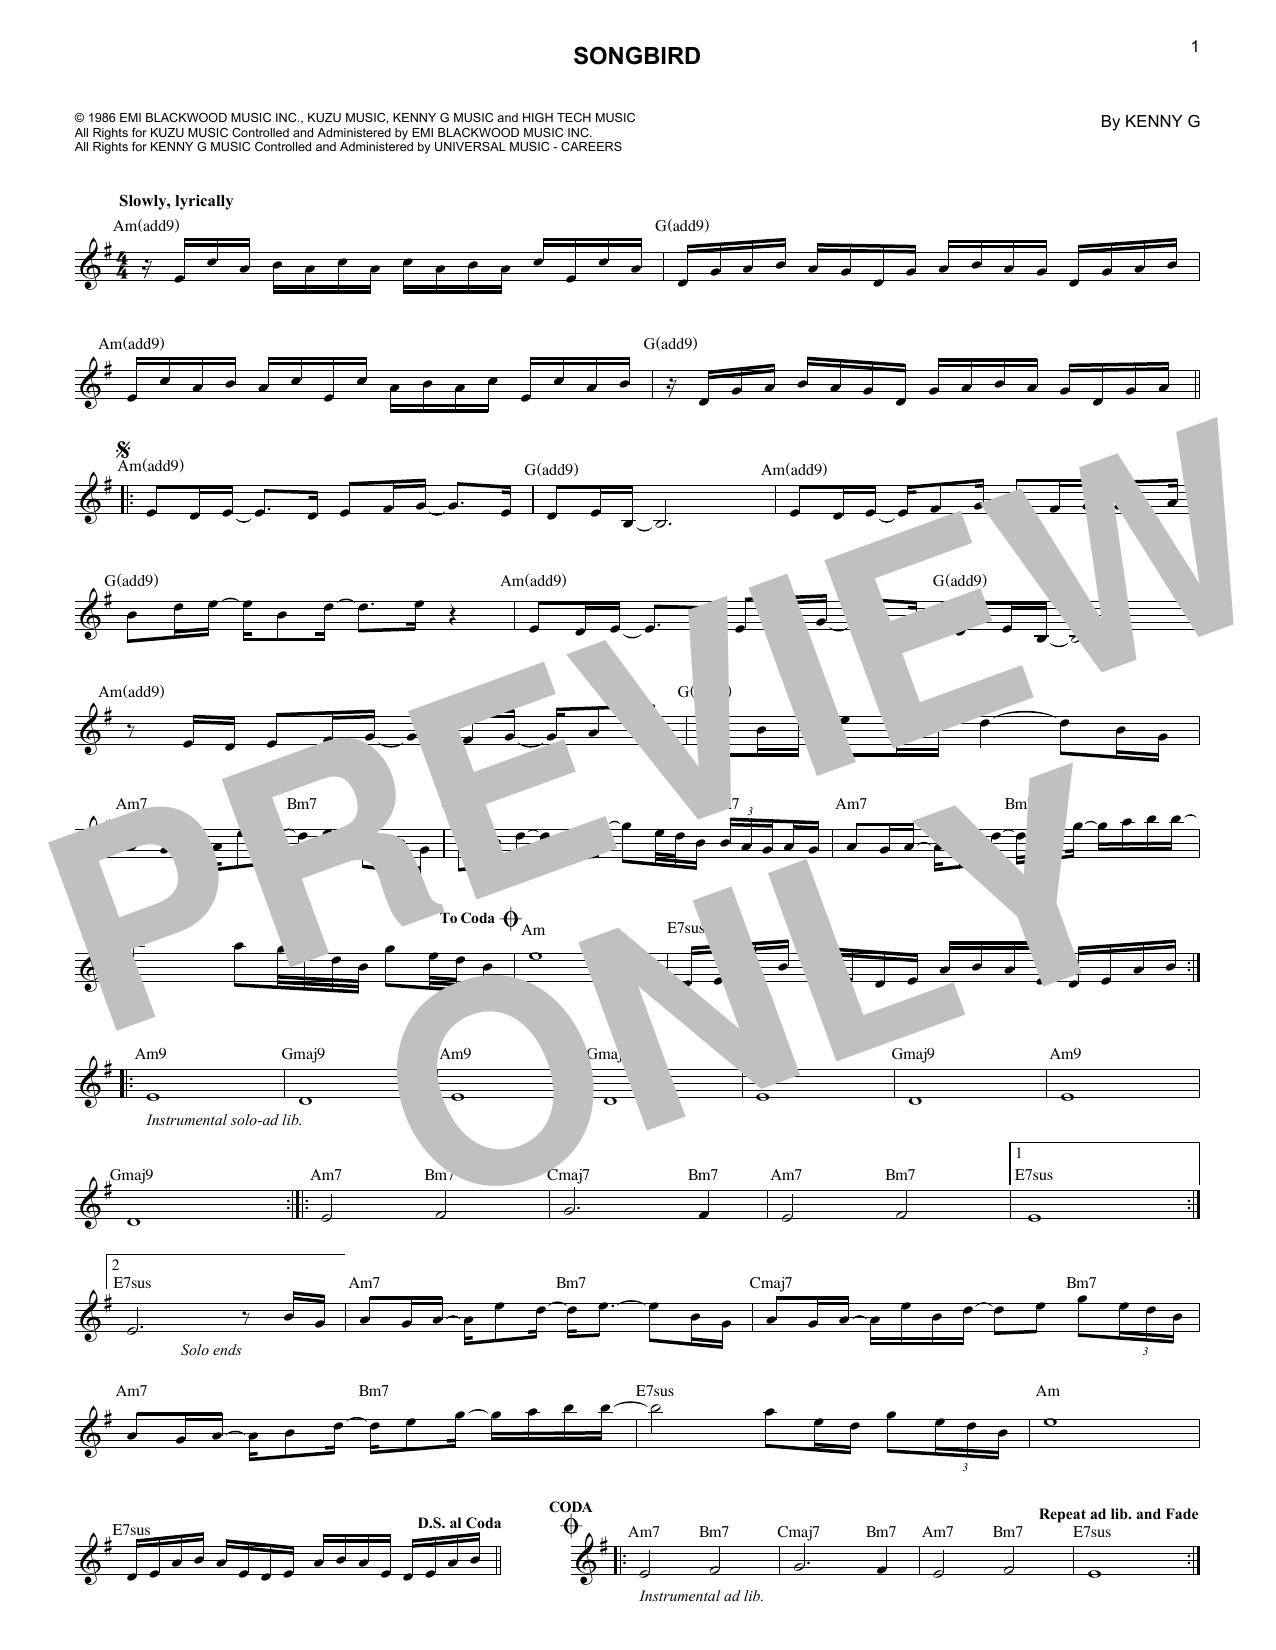 Kenny G Songbird Sheet Music Notes Chords Printable Jazz Melody